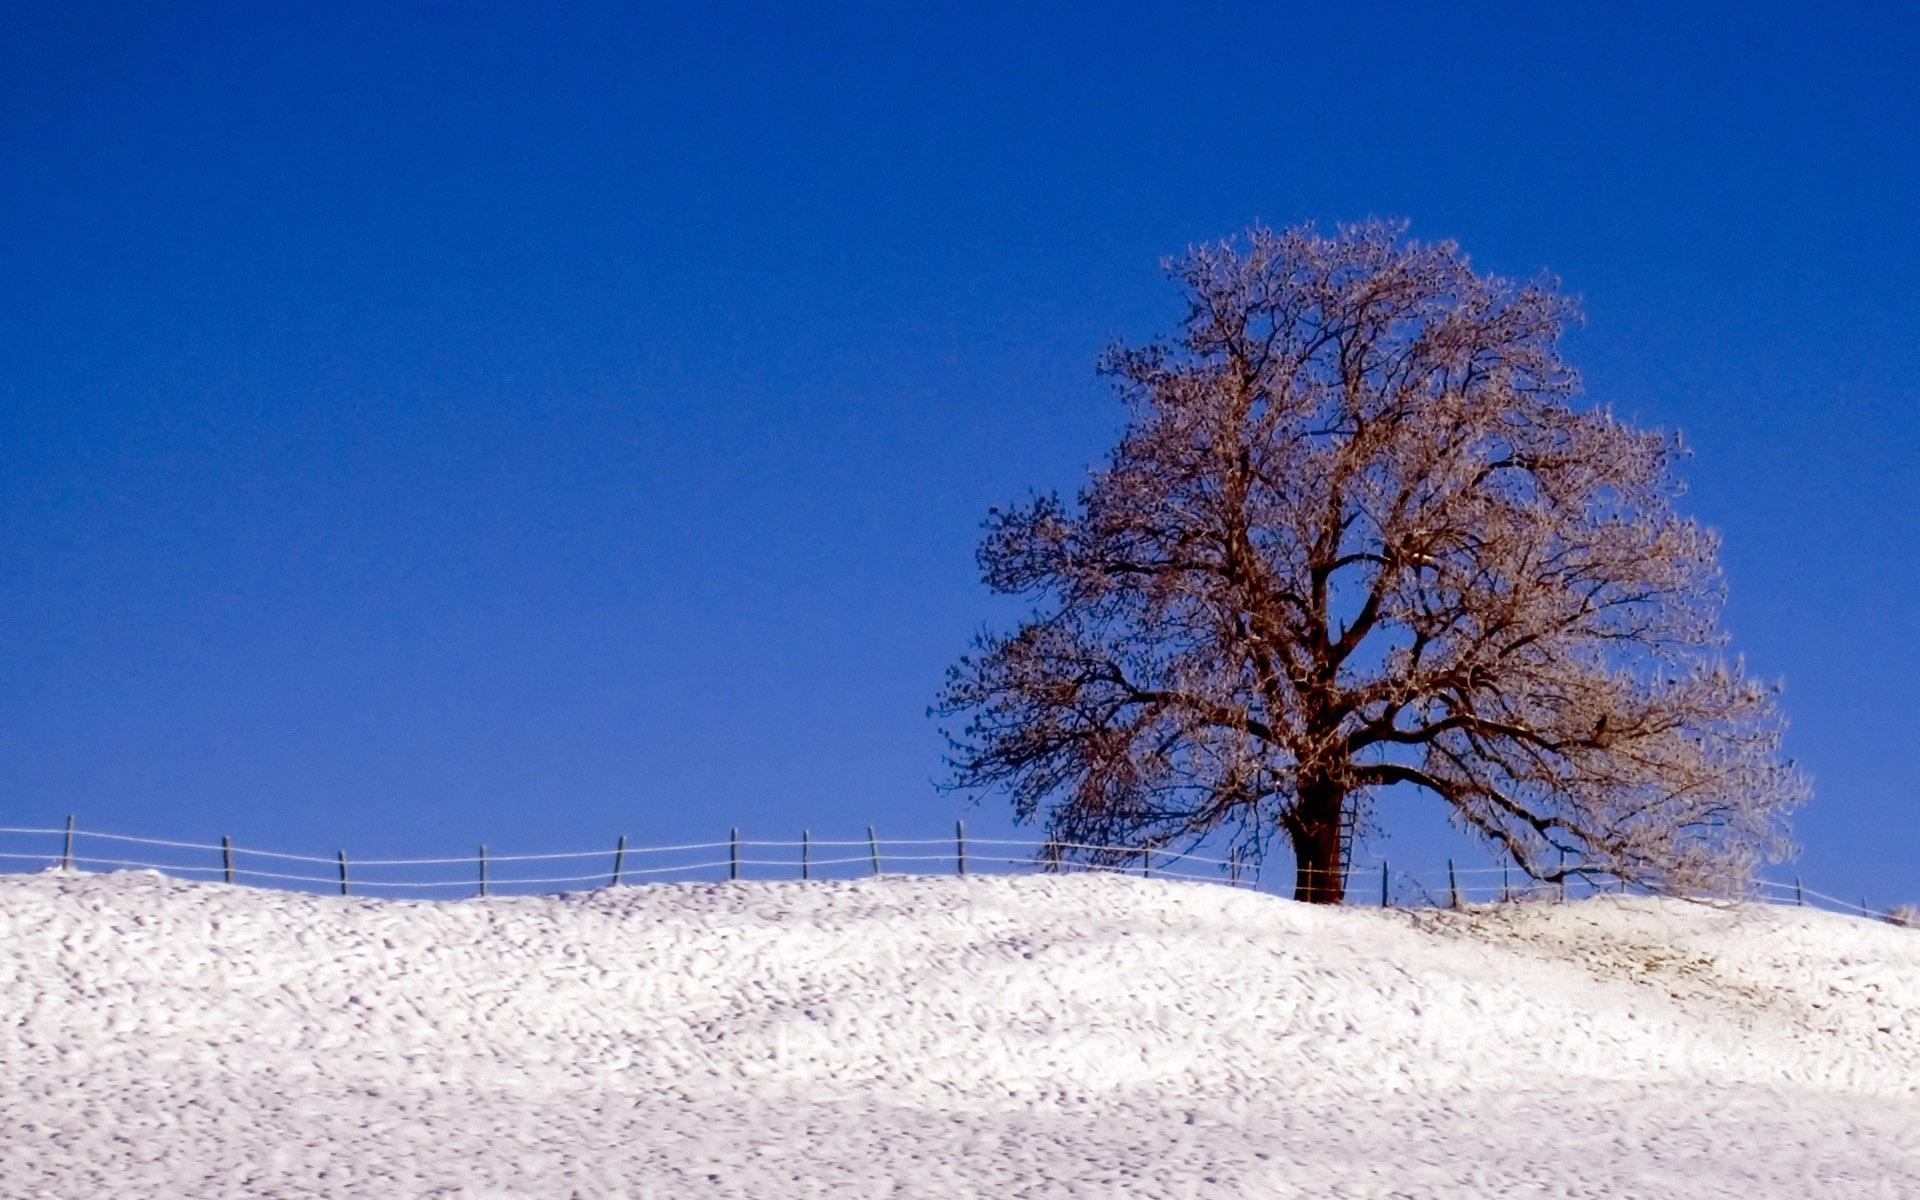 Widescreen Winter Scene Wallpaper - WallpaperSafari